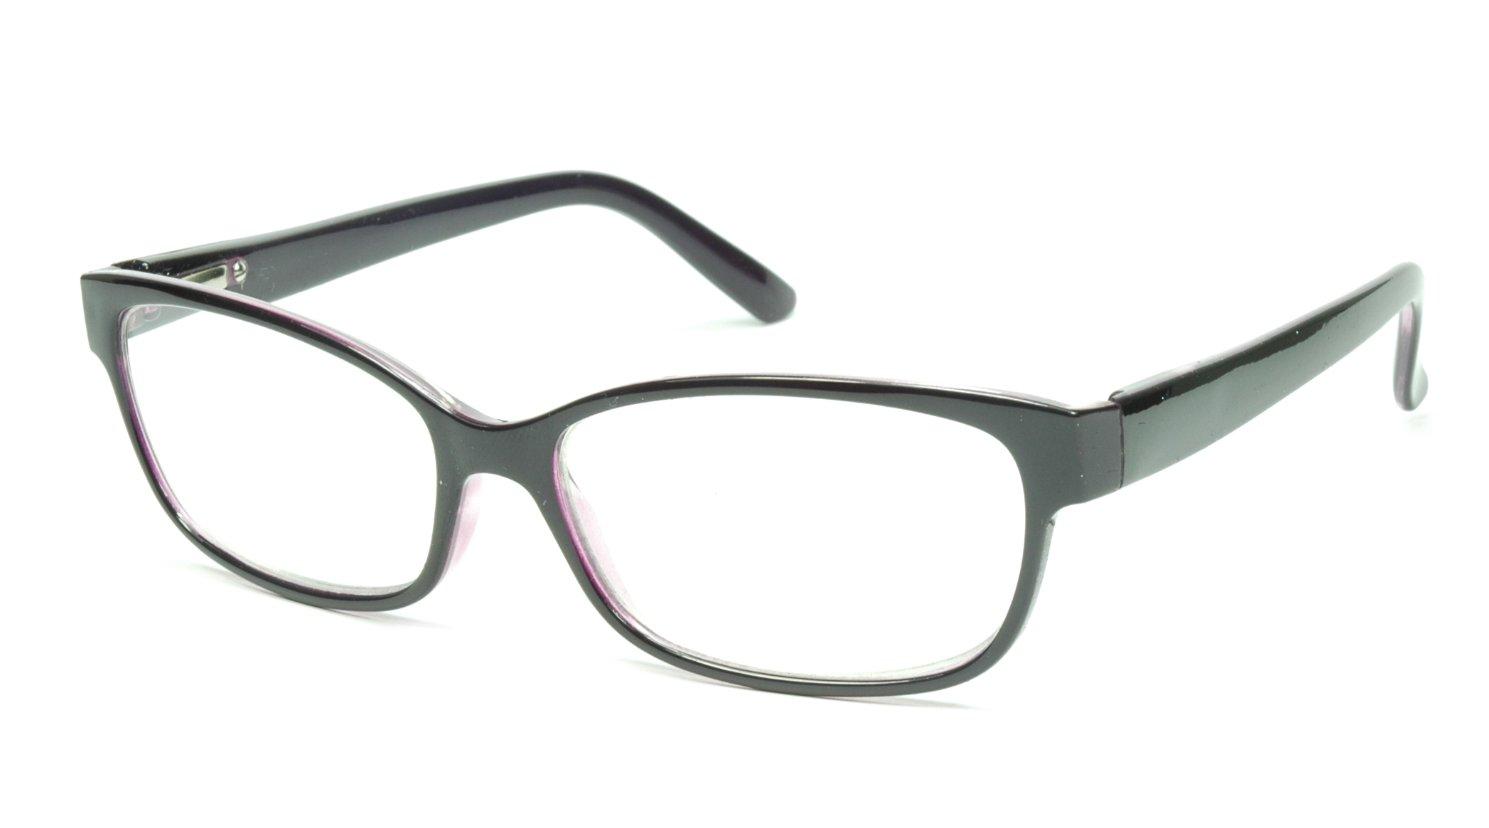 Image of Visa Reading Glasses (#111302) Black